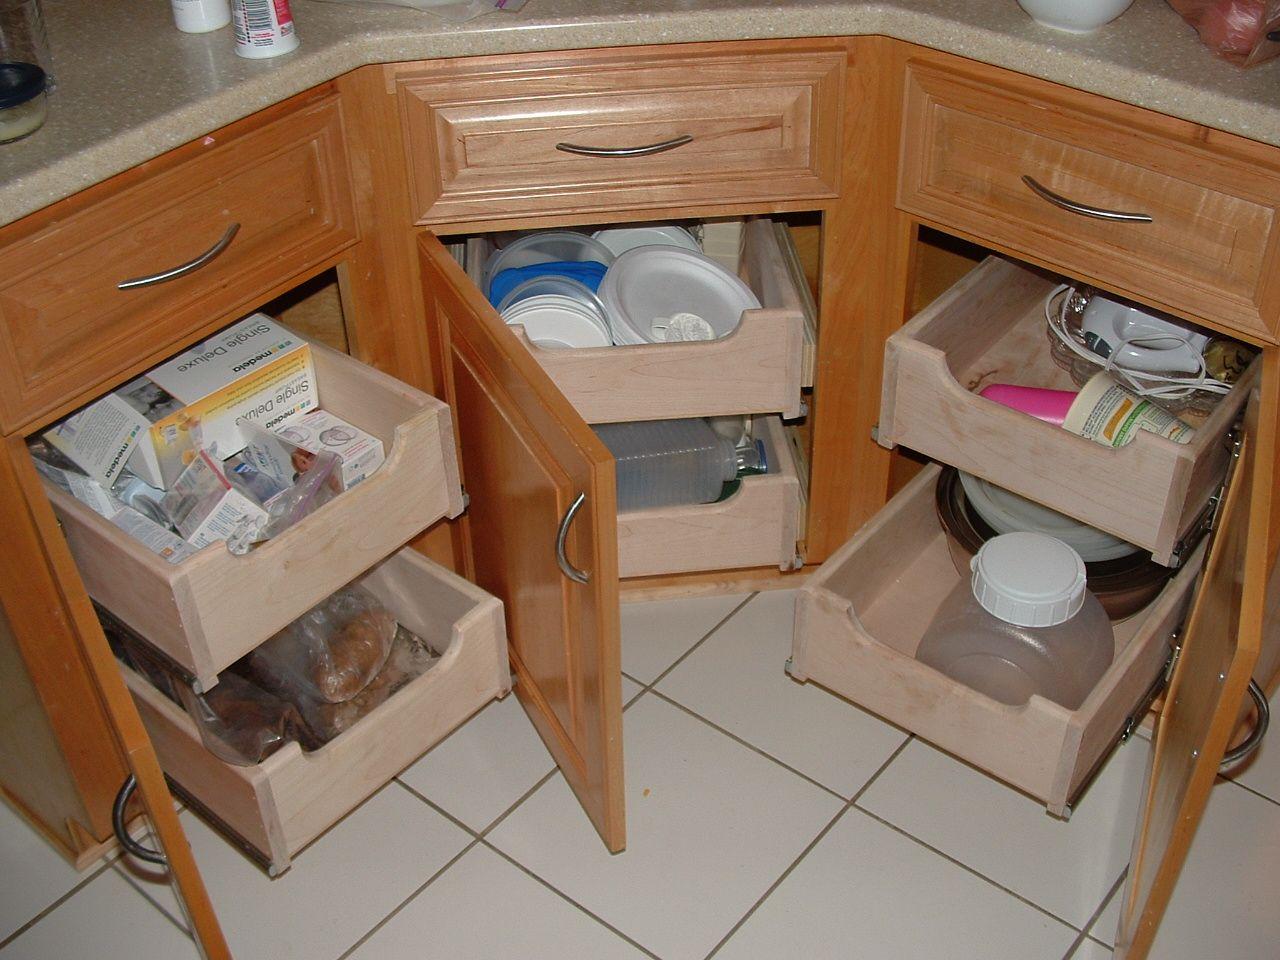 17 Best images about Kitchen on Pinterest | Corner cabinets, Kitchen drawers  and Travertine tile backsplash